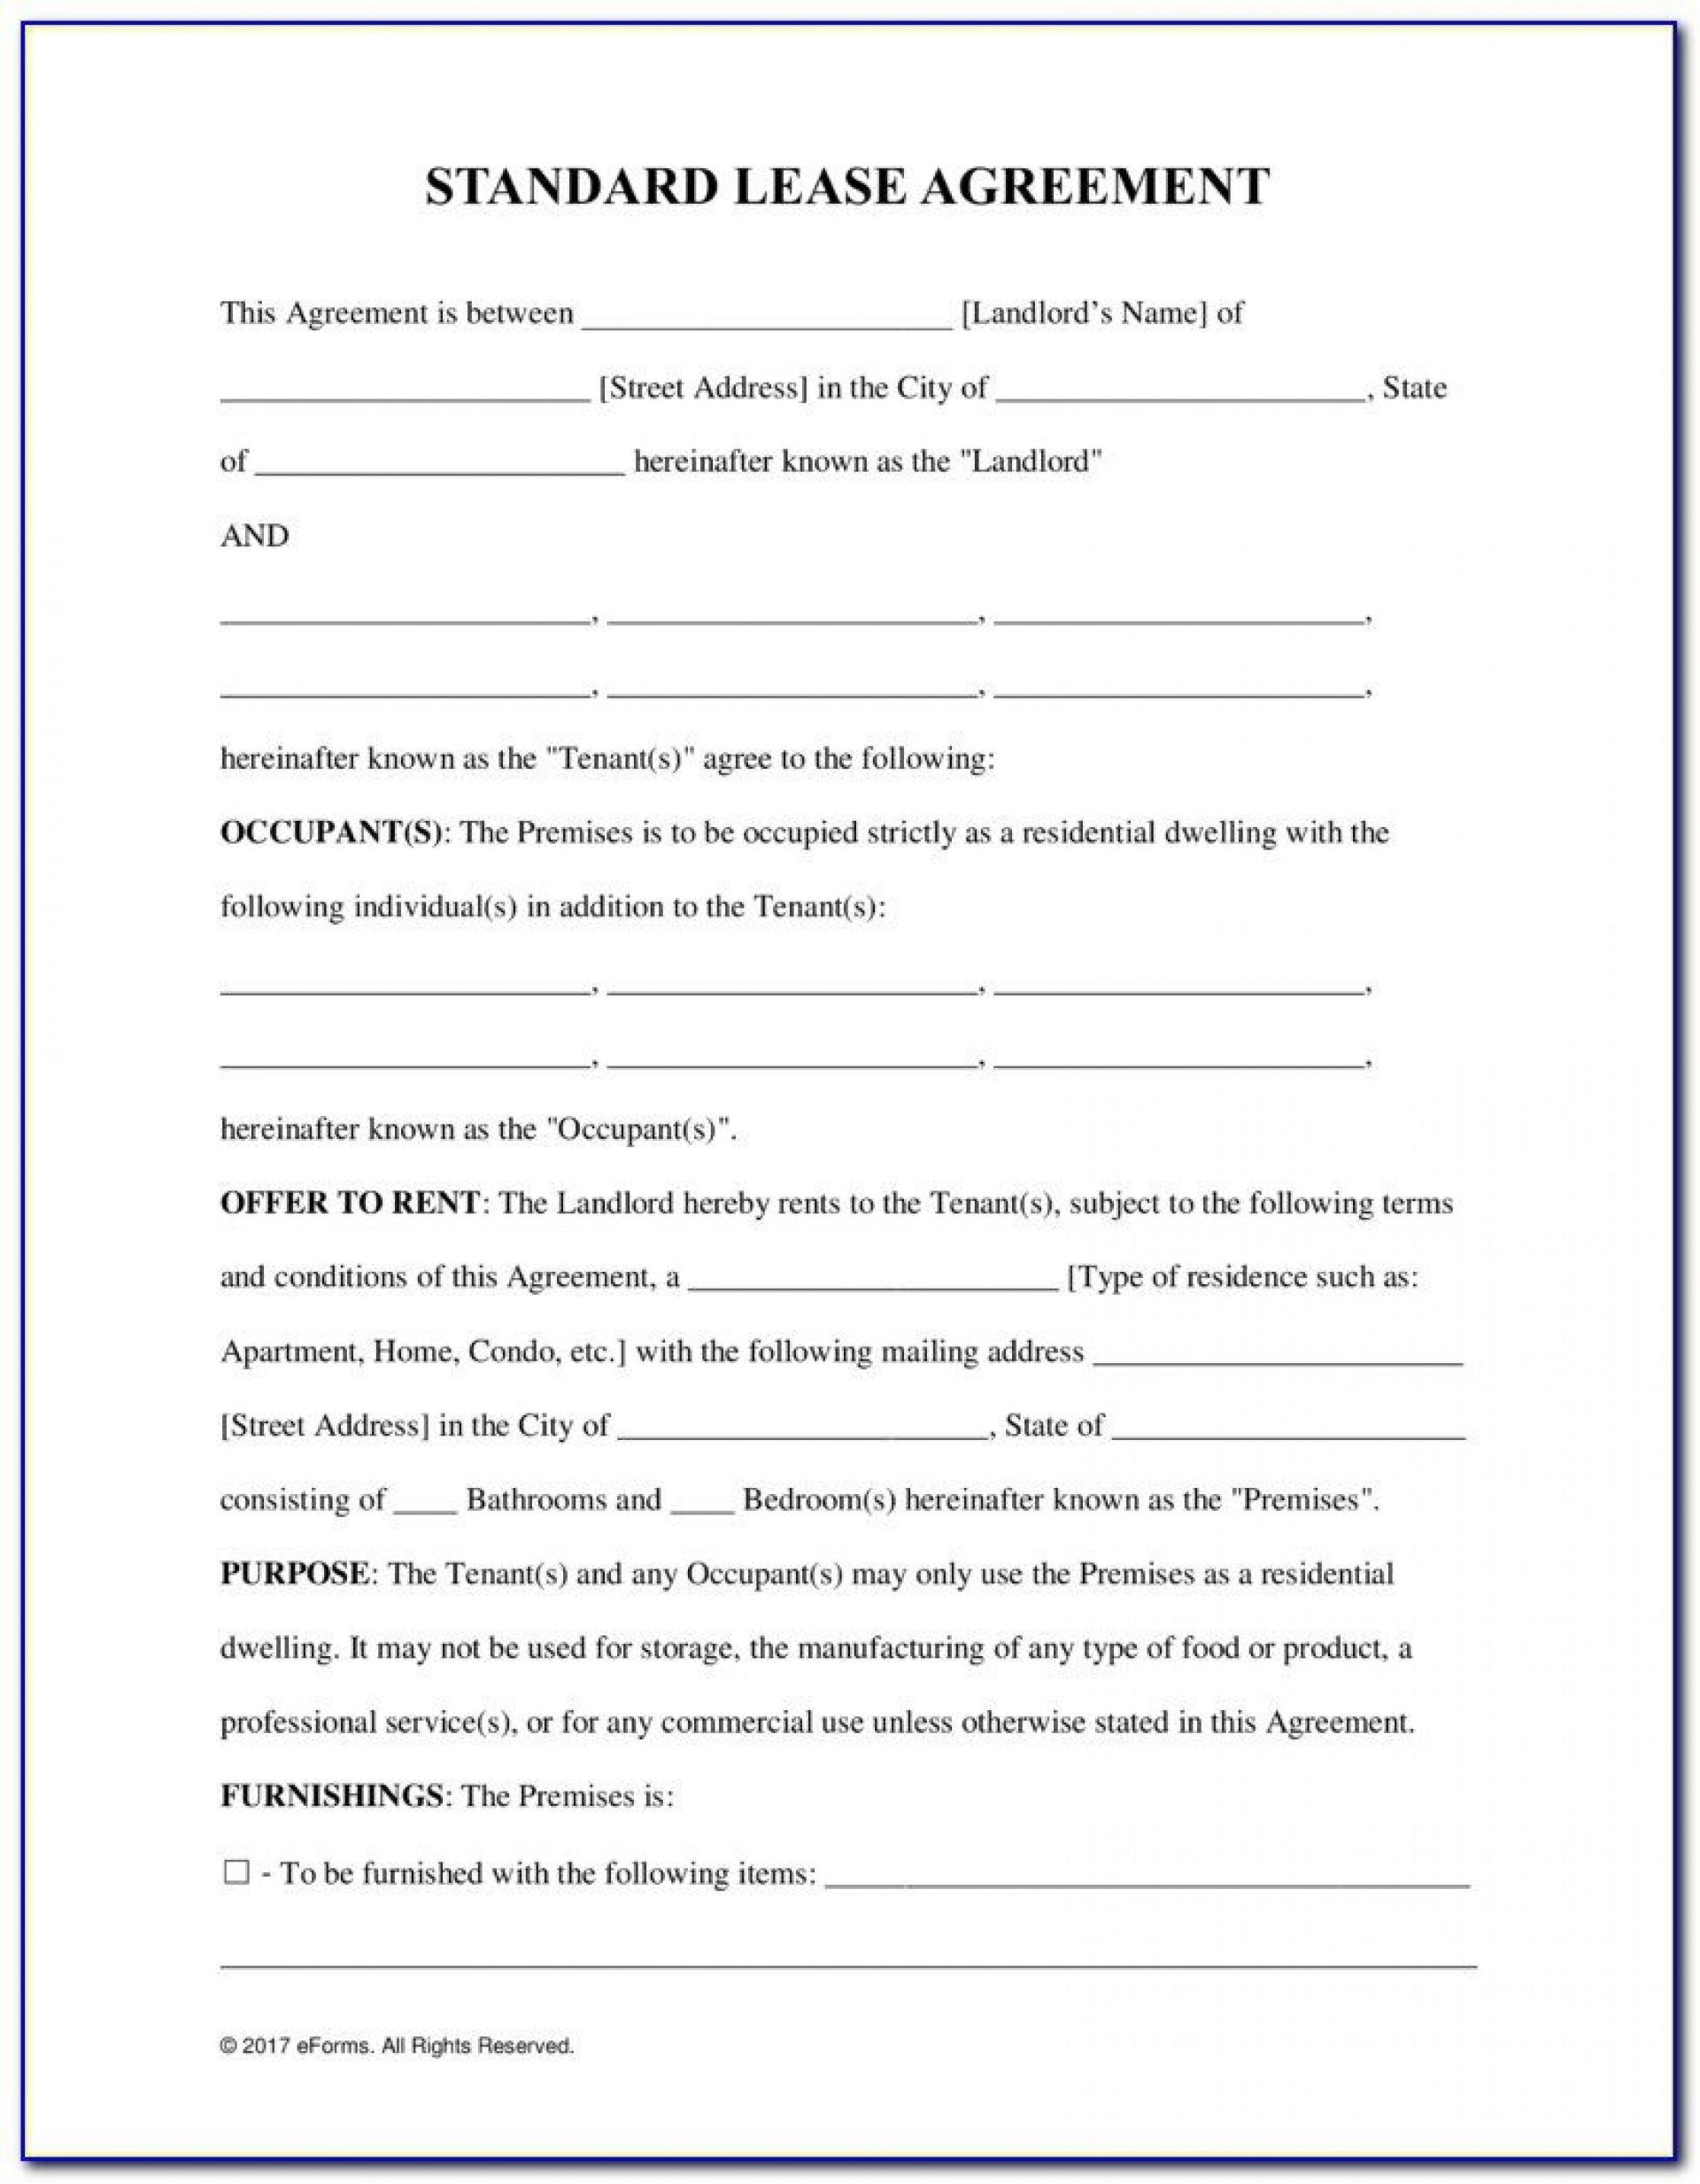 009 Impressive Tenancy Agreement Template Word Free Example  Uk 2020 Rental Doc Lease1920